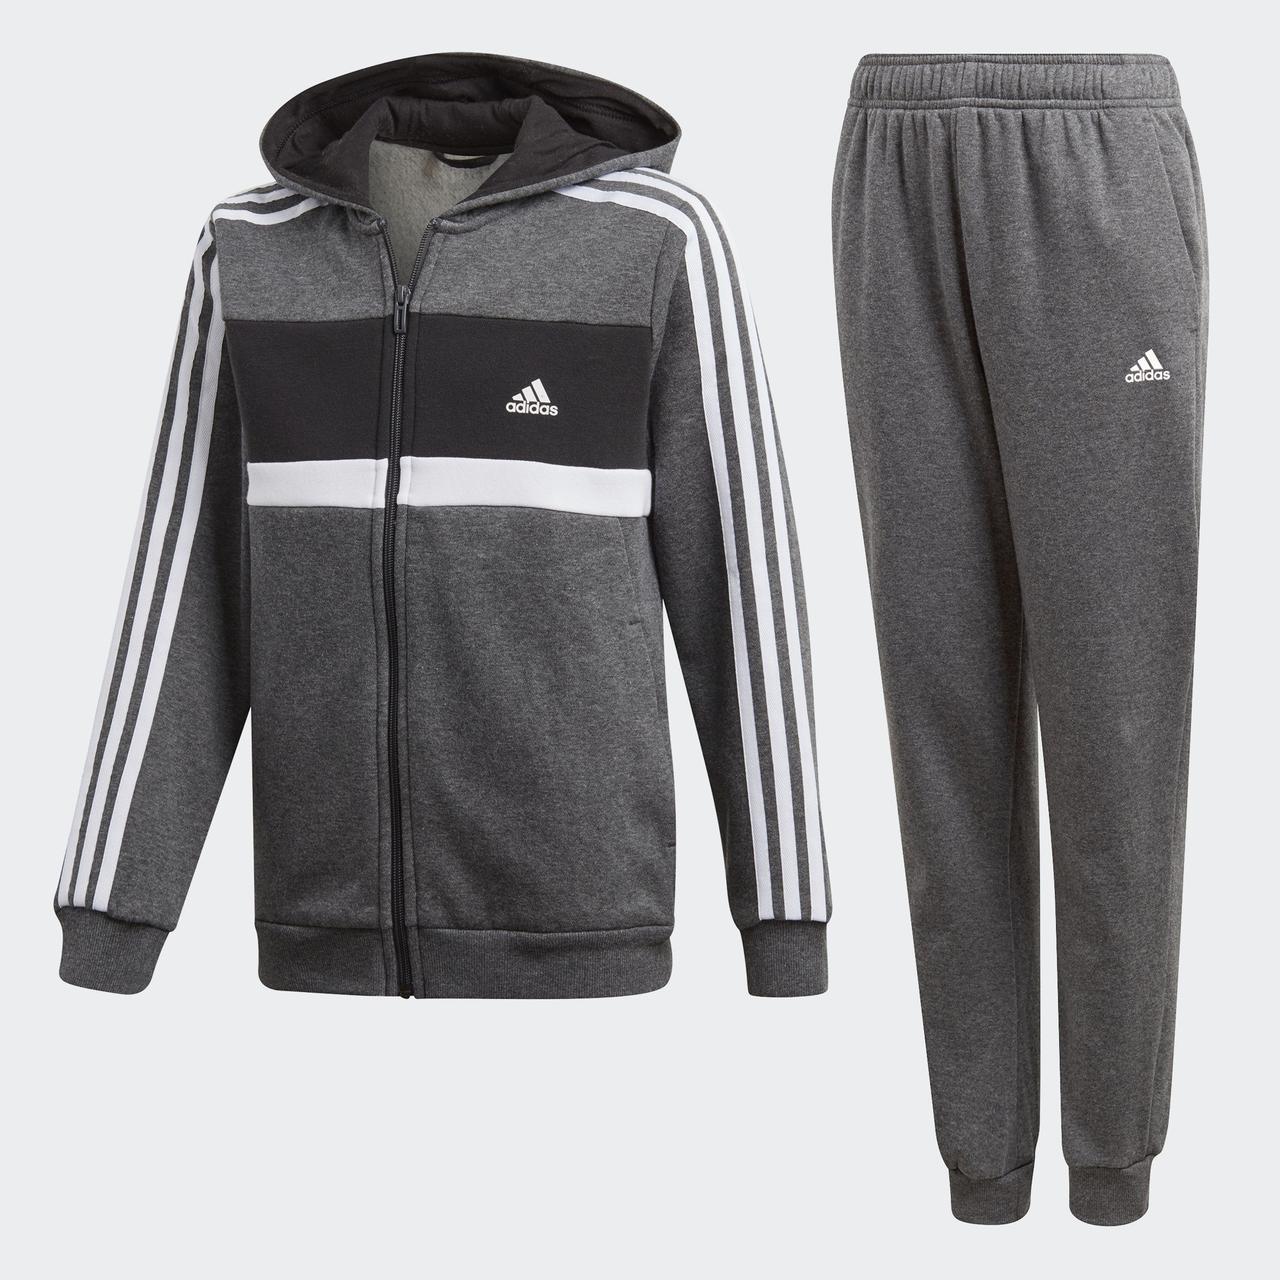 e128a2374388c0 Детский костюм Adidas Performance (Артикул: DN6908) - Интернет-магазин  «Эксперт»